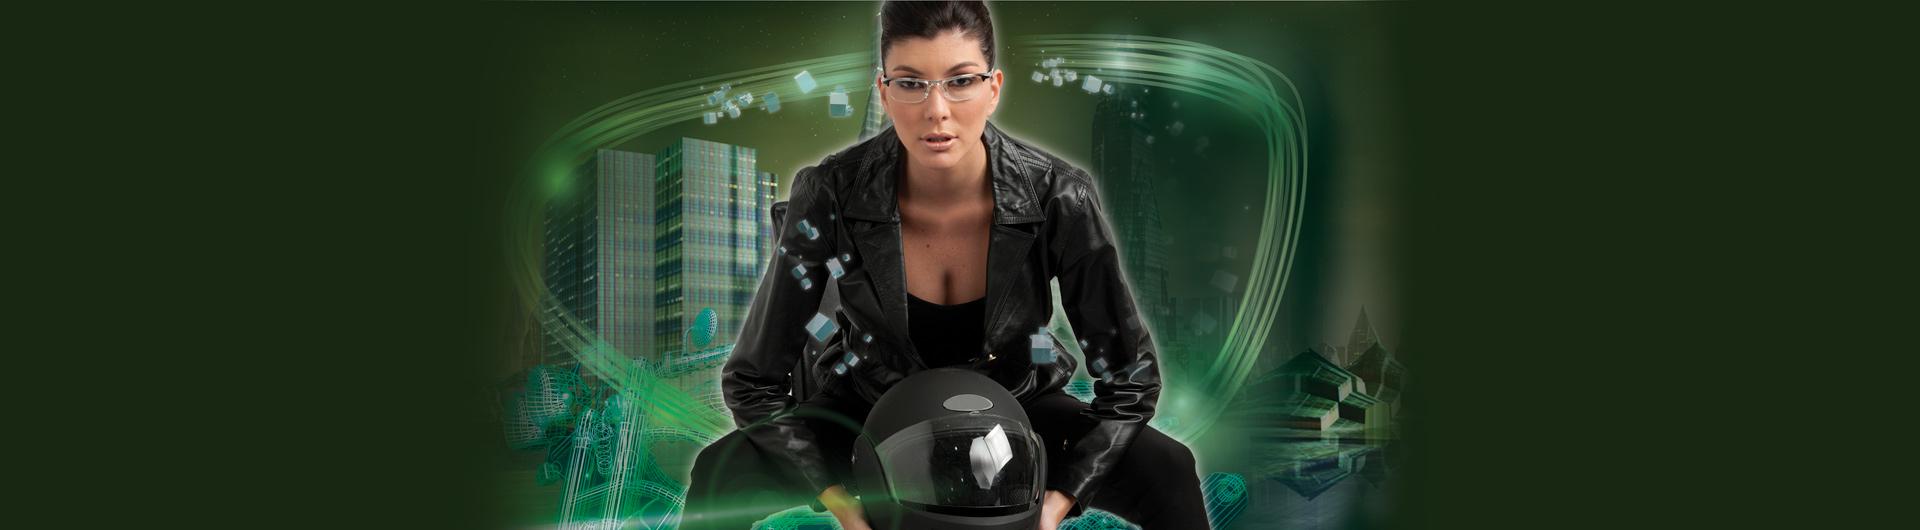 FutureX Xtreme HD